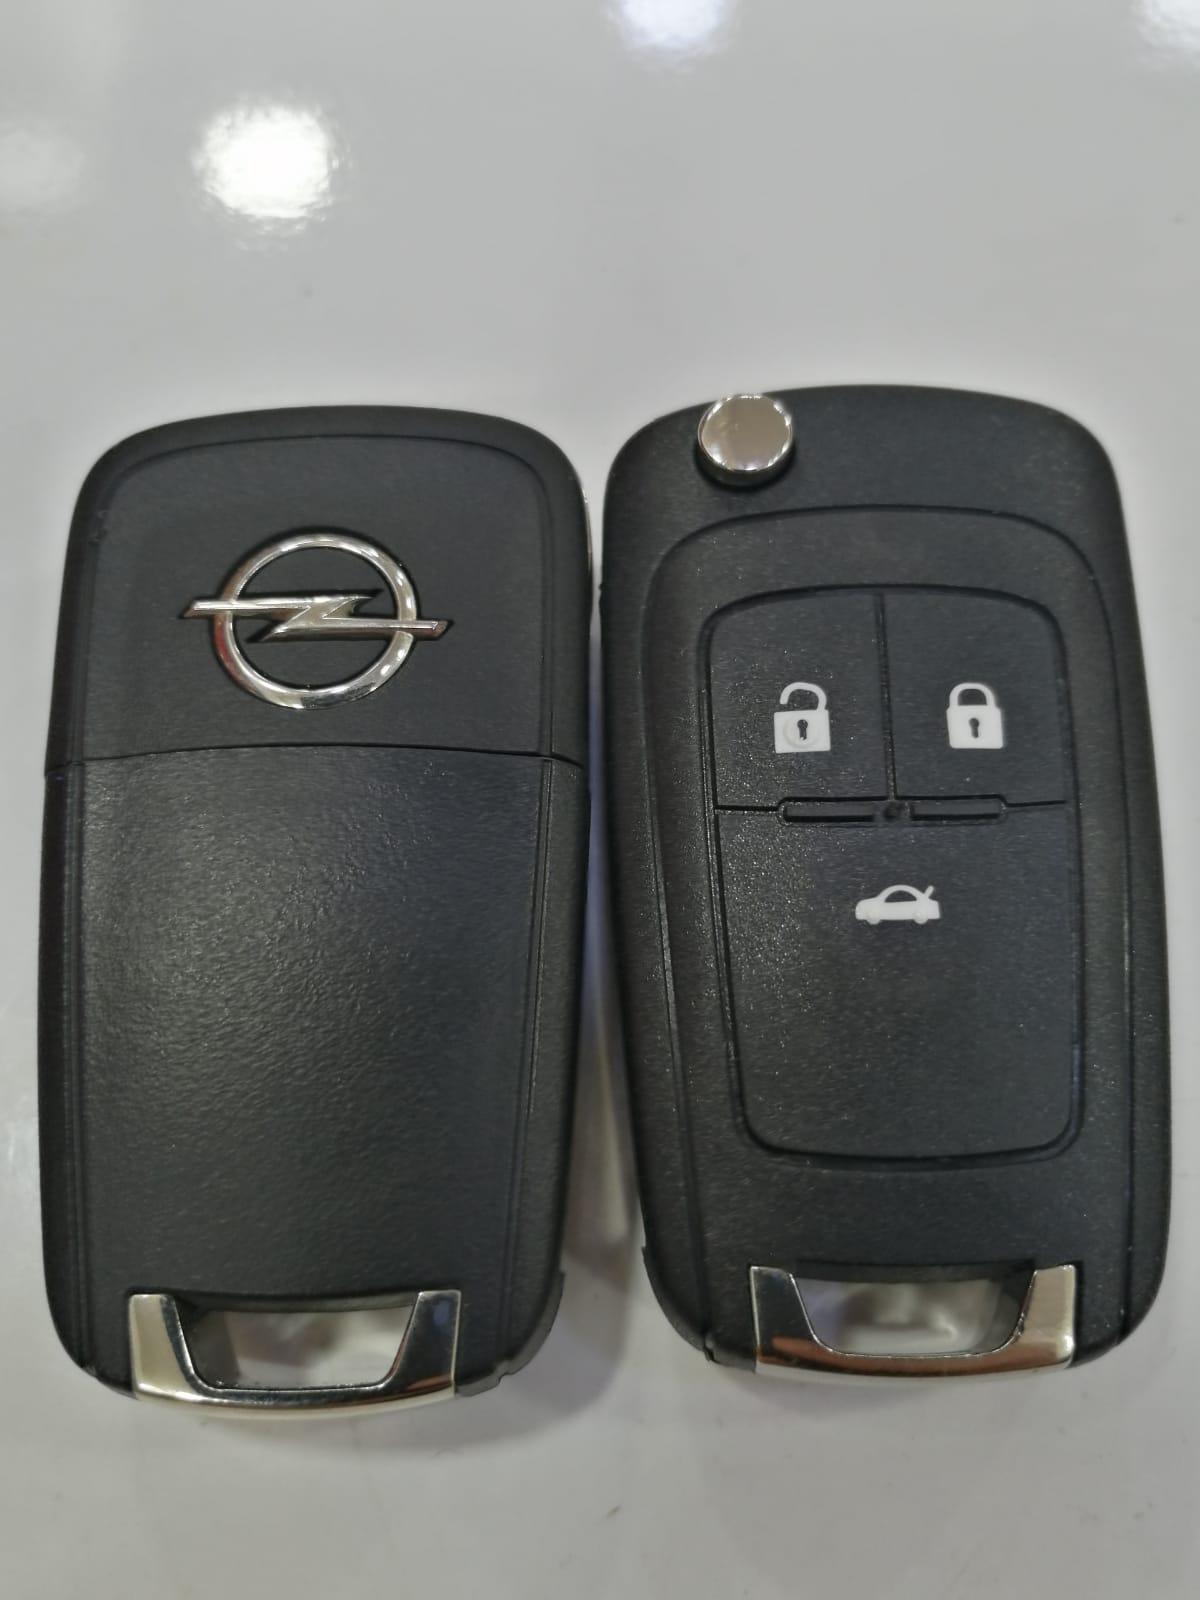 Astra J - insignia 3 buton